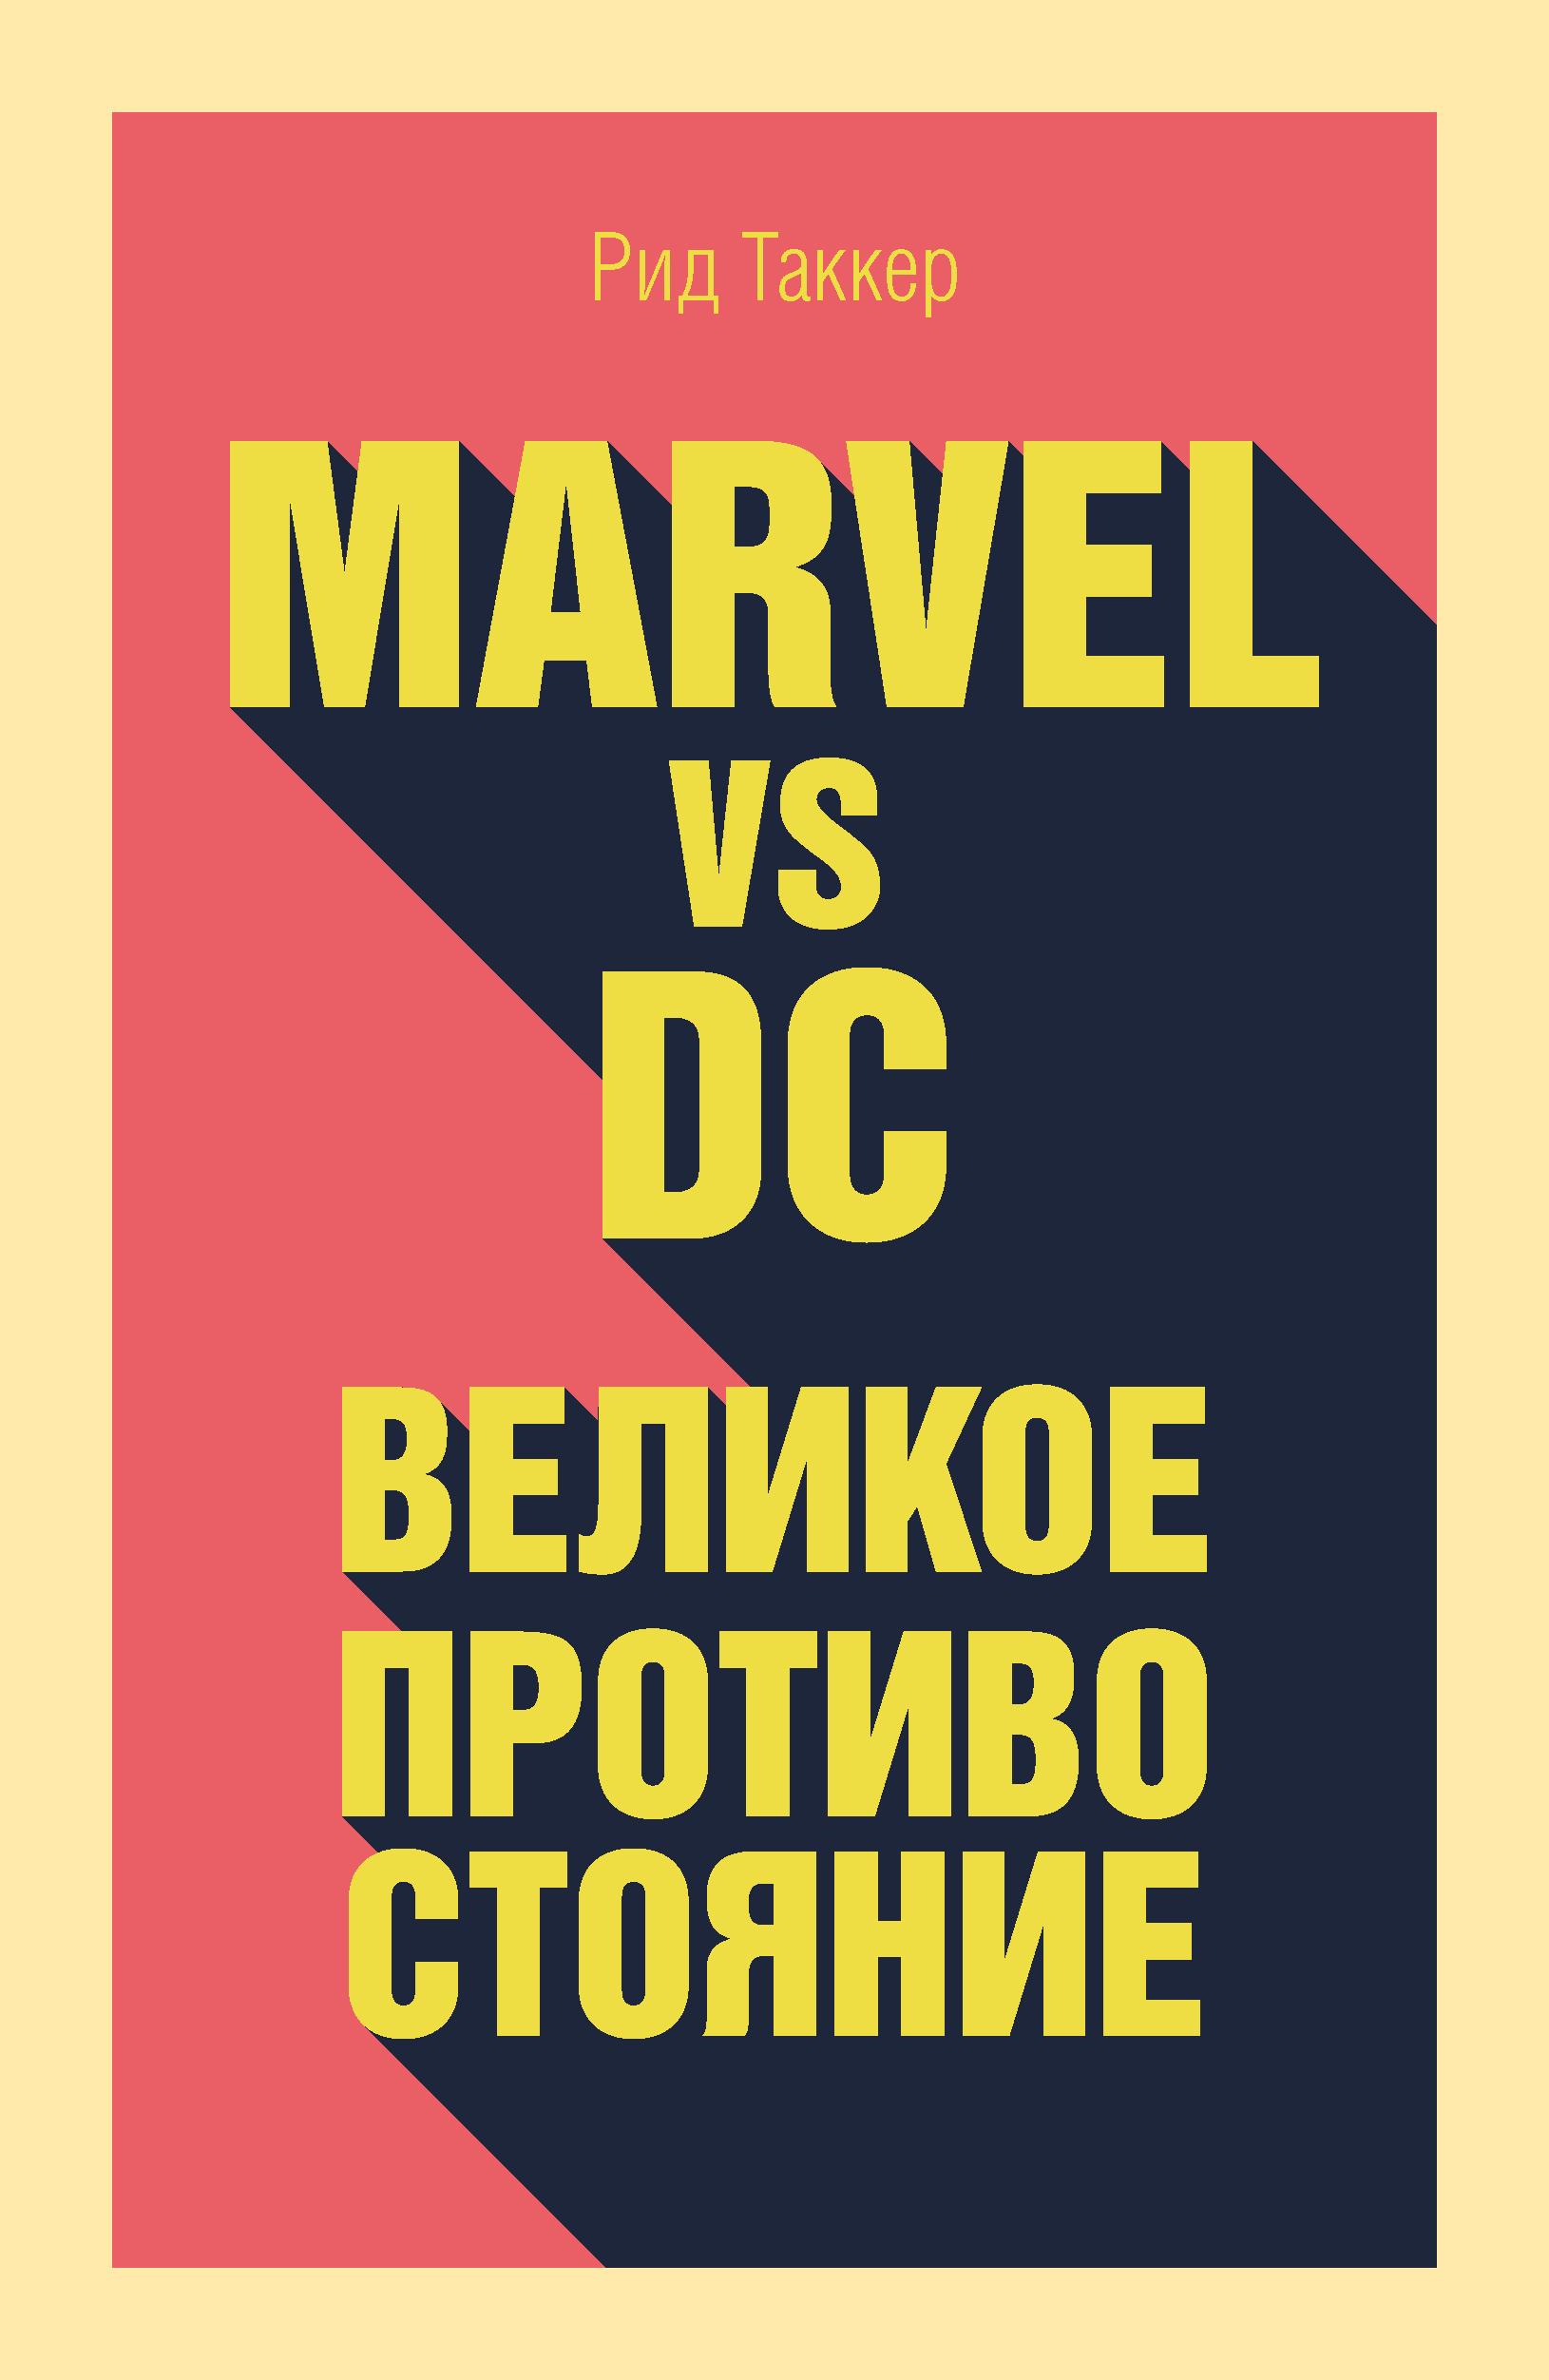 Фото - Рид Таккер Marvel vs DC. Великое противостояние двух вселенных таккер р marvel vs dc великое противостояние двух вселенных